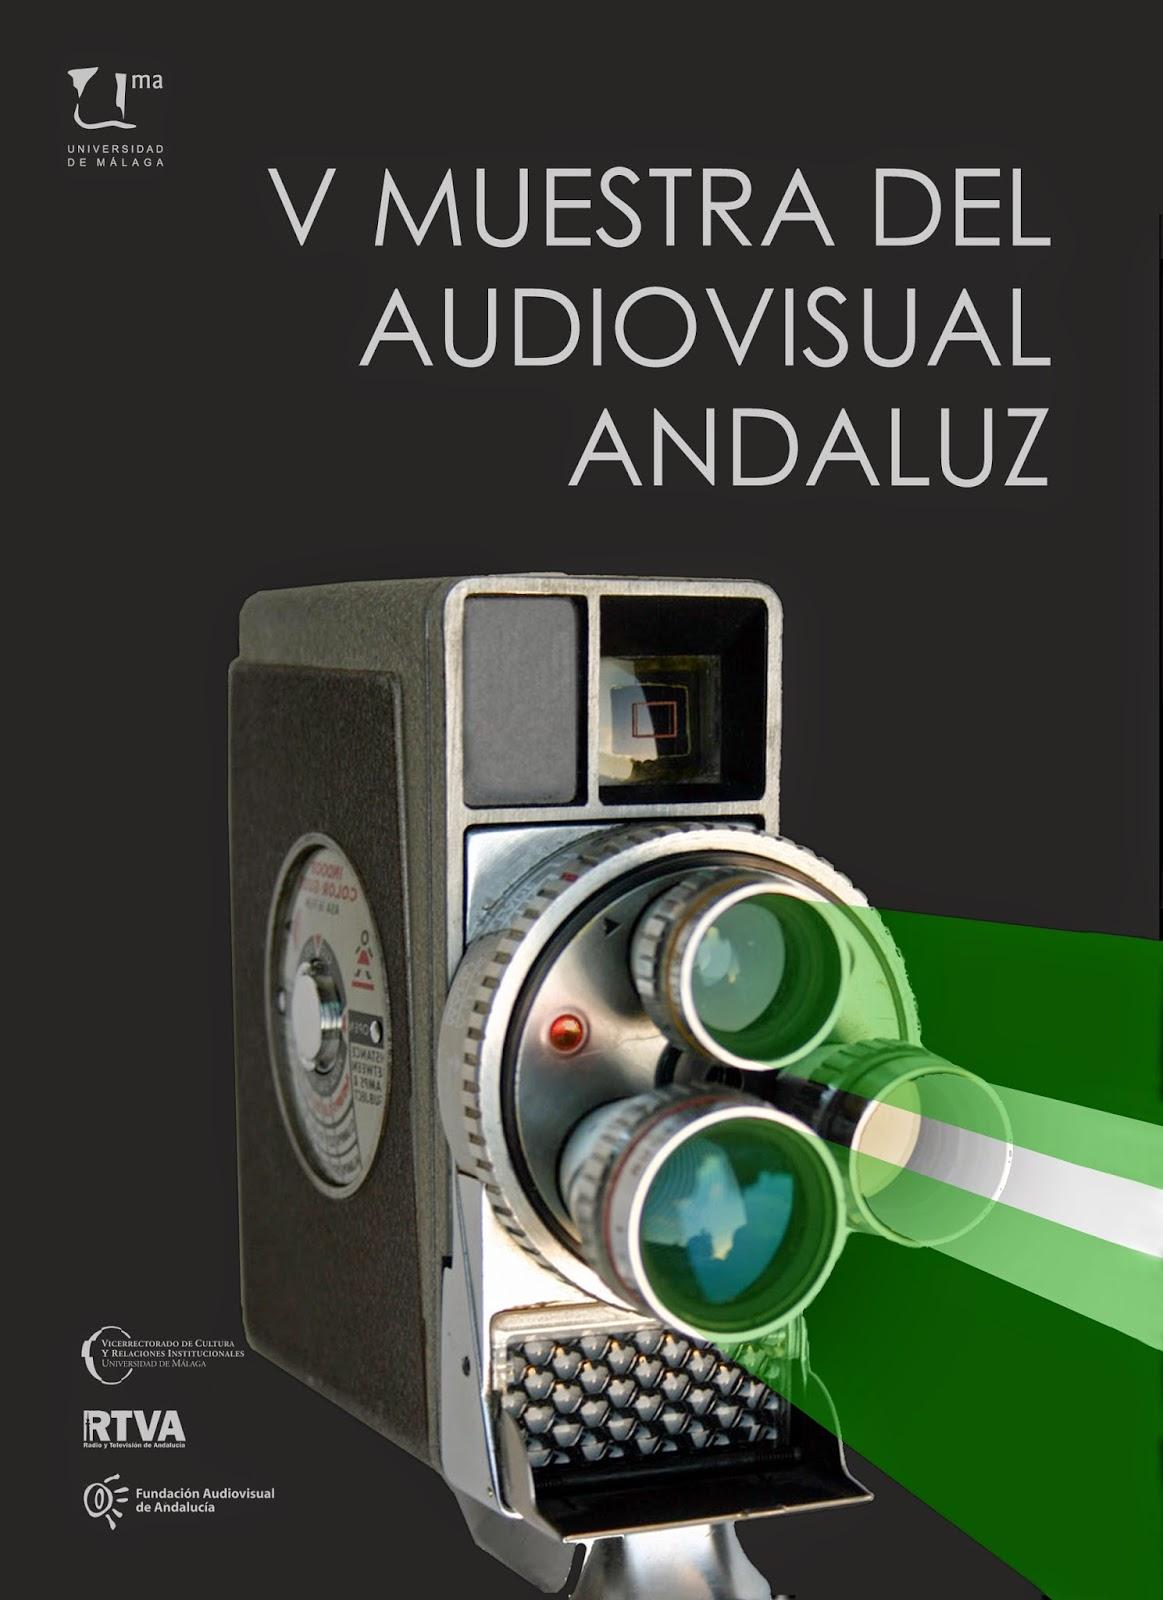 cartel V muestra del audiovisual andaluz de la universidad de Málaga